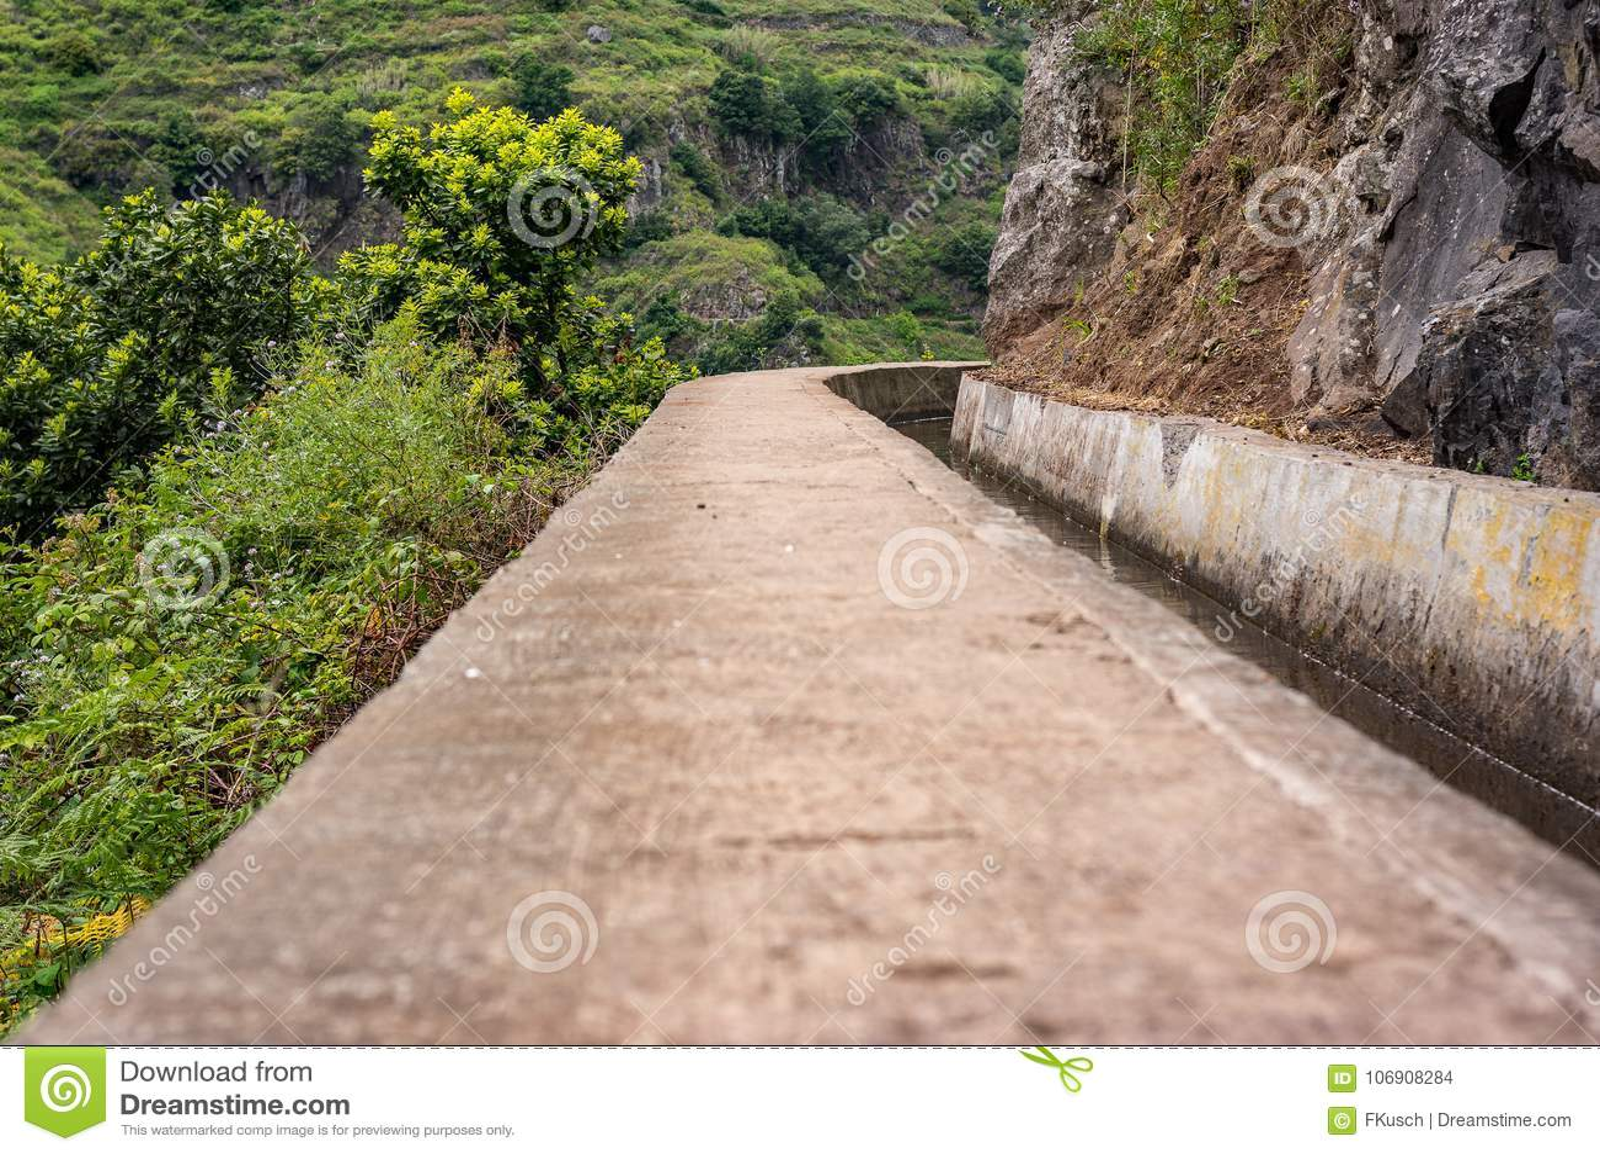 Levada ścieżka na maderze, Portugalia